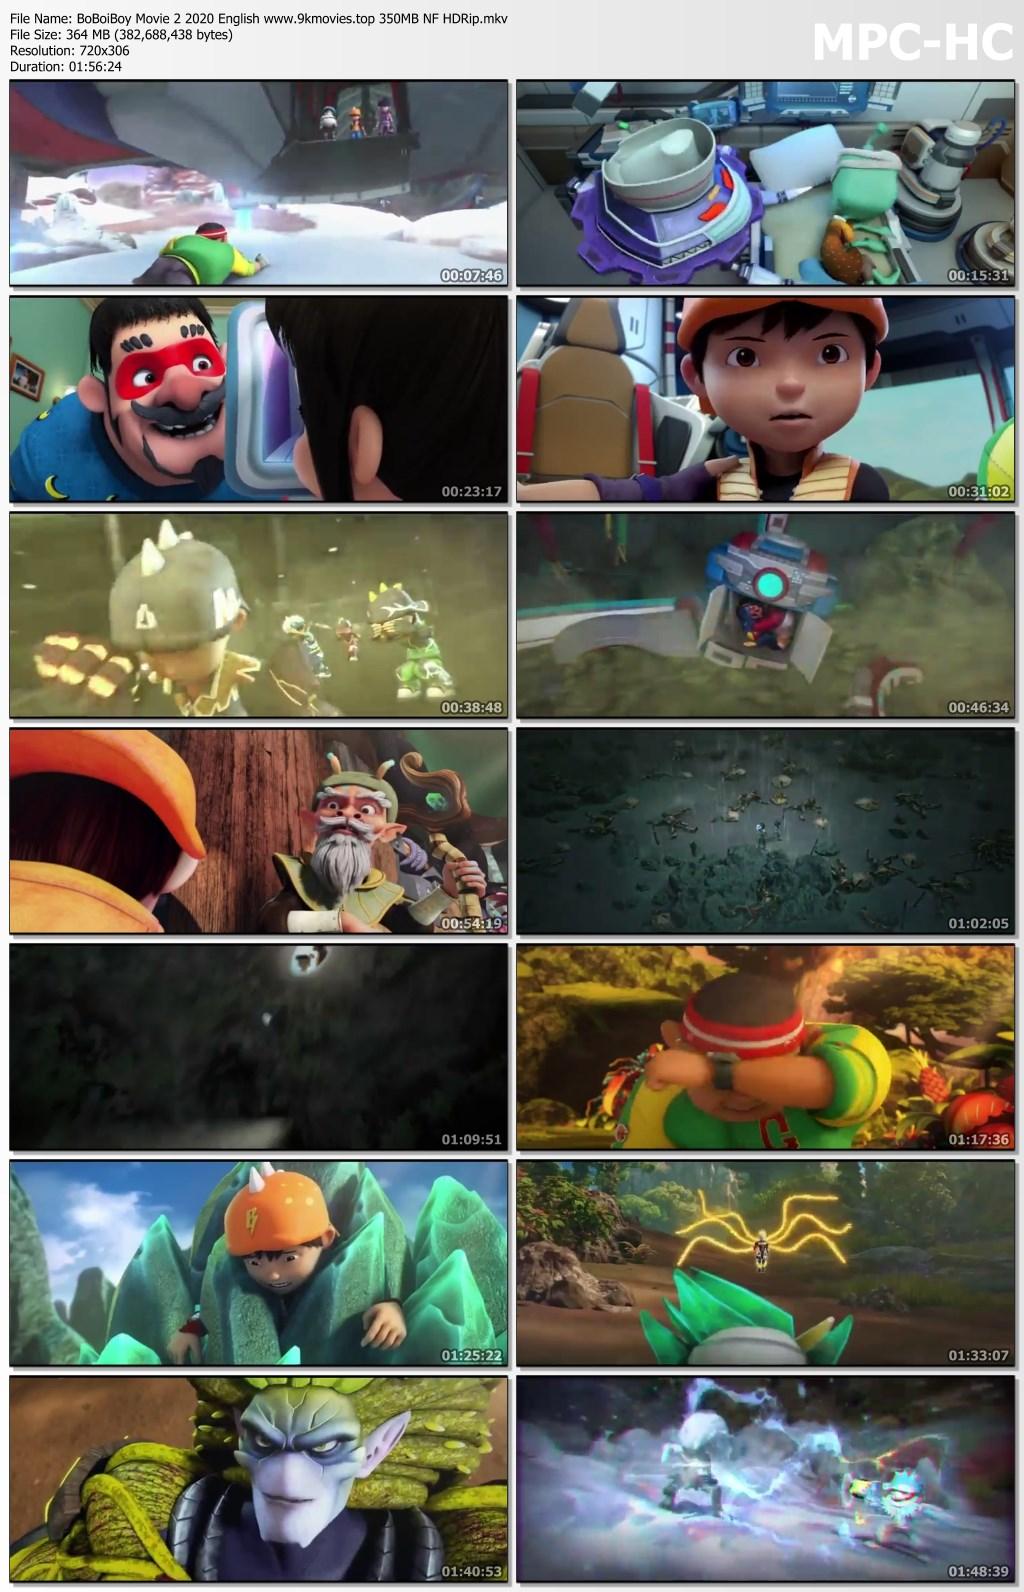 Download Film Boboiboy The Movie 2 Lk21 : download, boboiboy, movie, Boboiboy, Movie, English